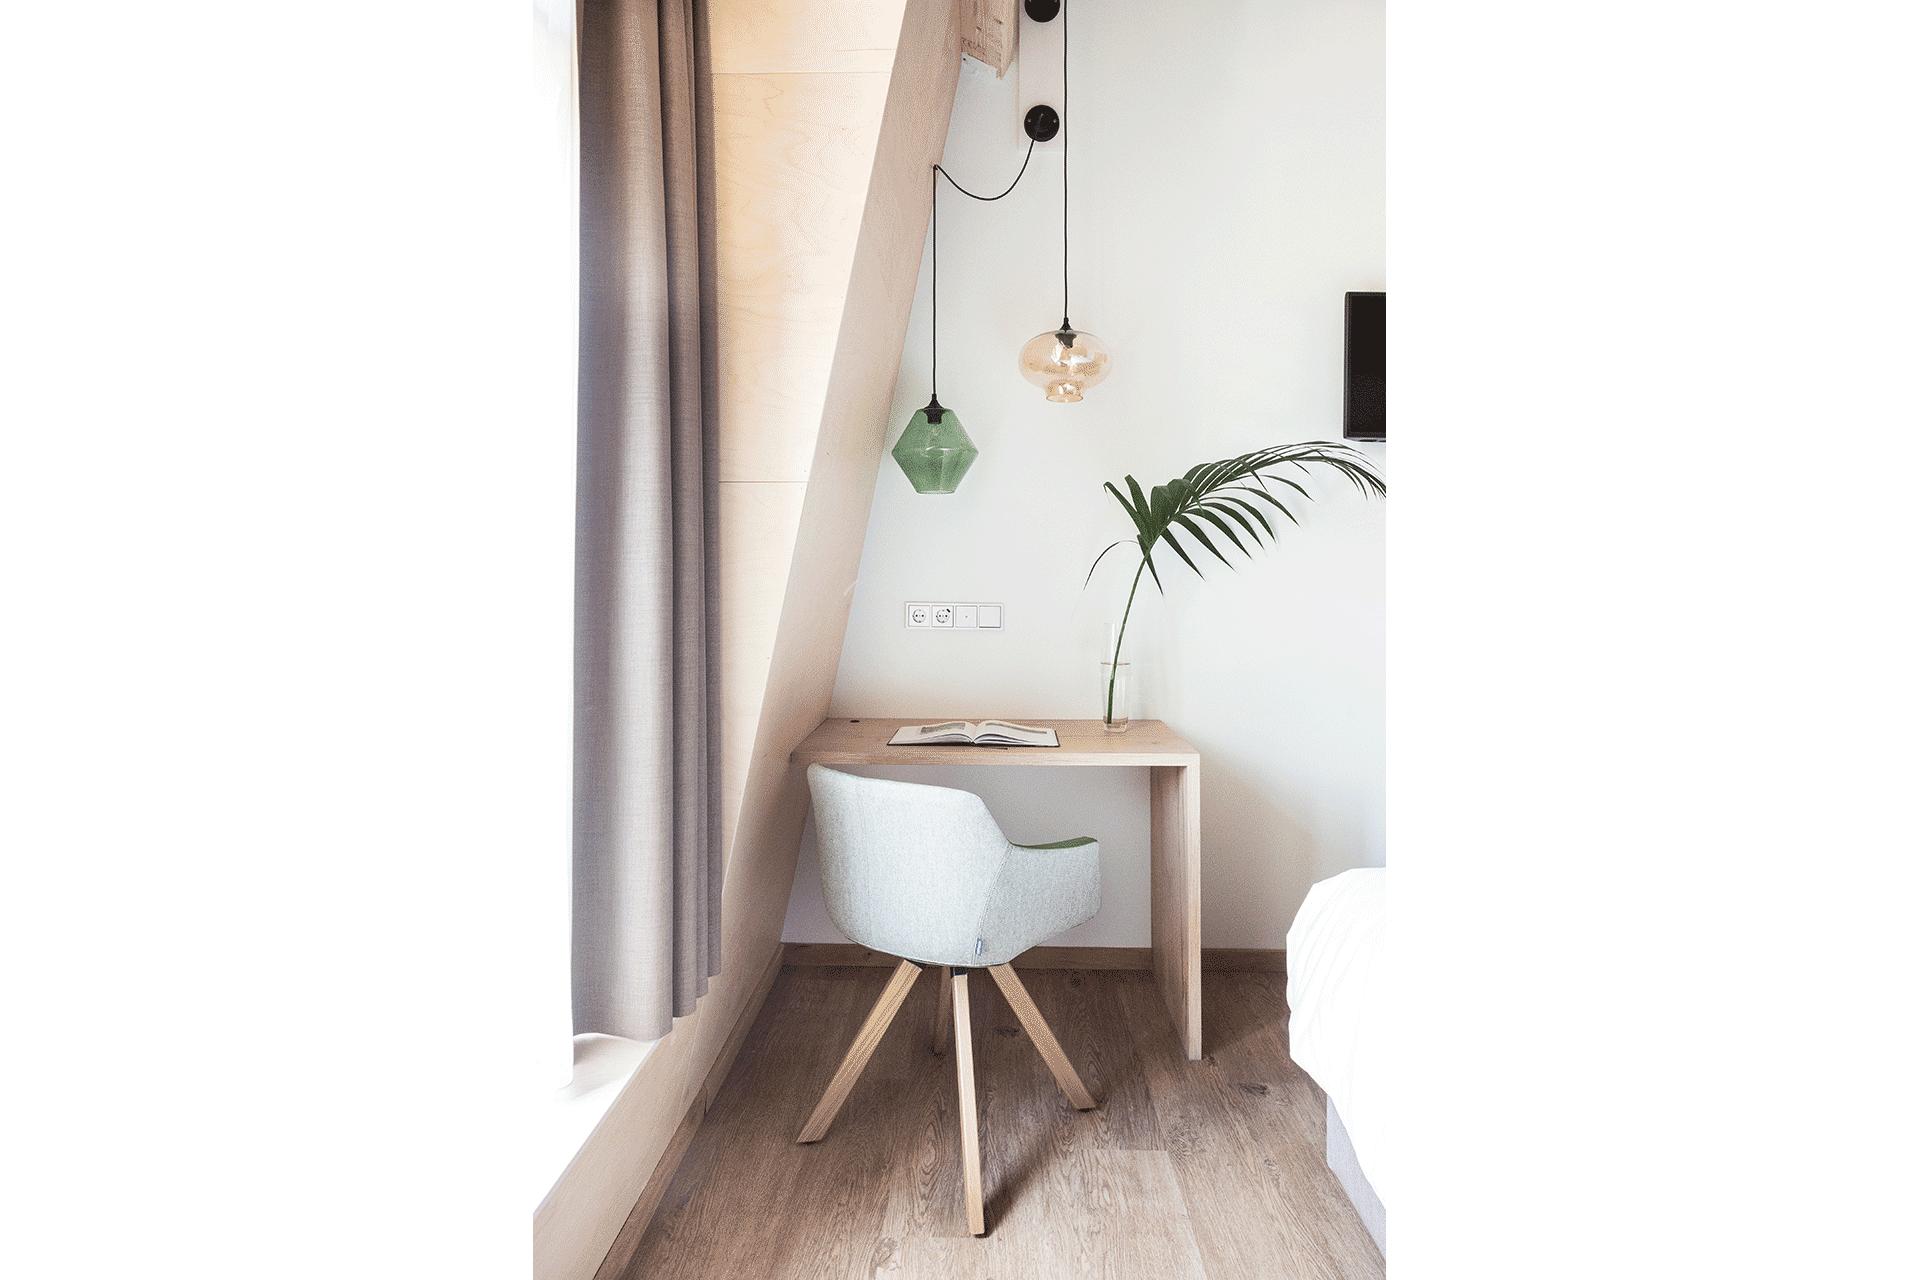 design stoel hotelkamer plant groen hout hotel designhotel vught den bosch passief huis